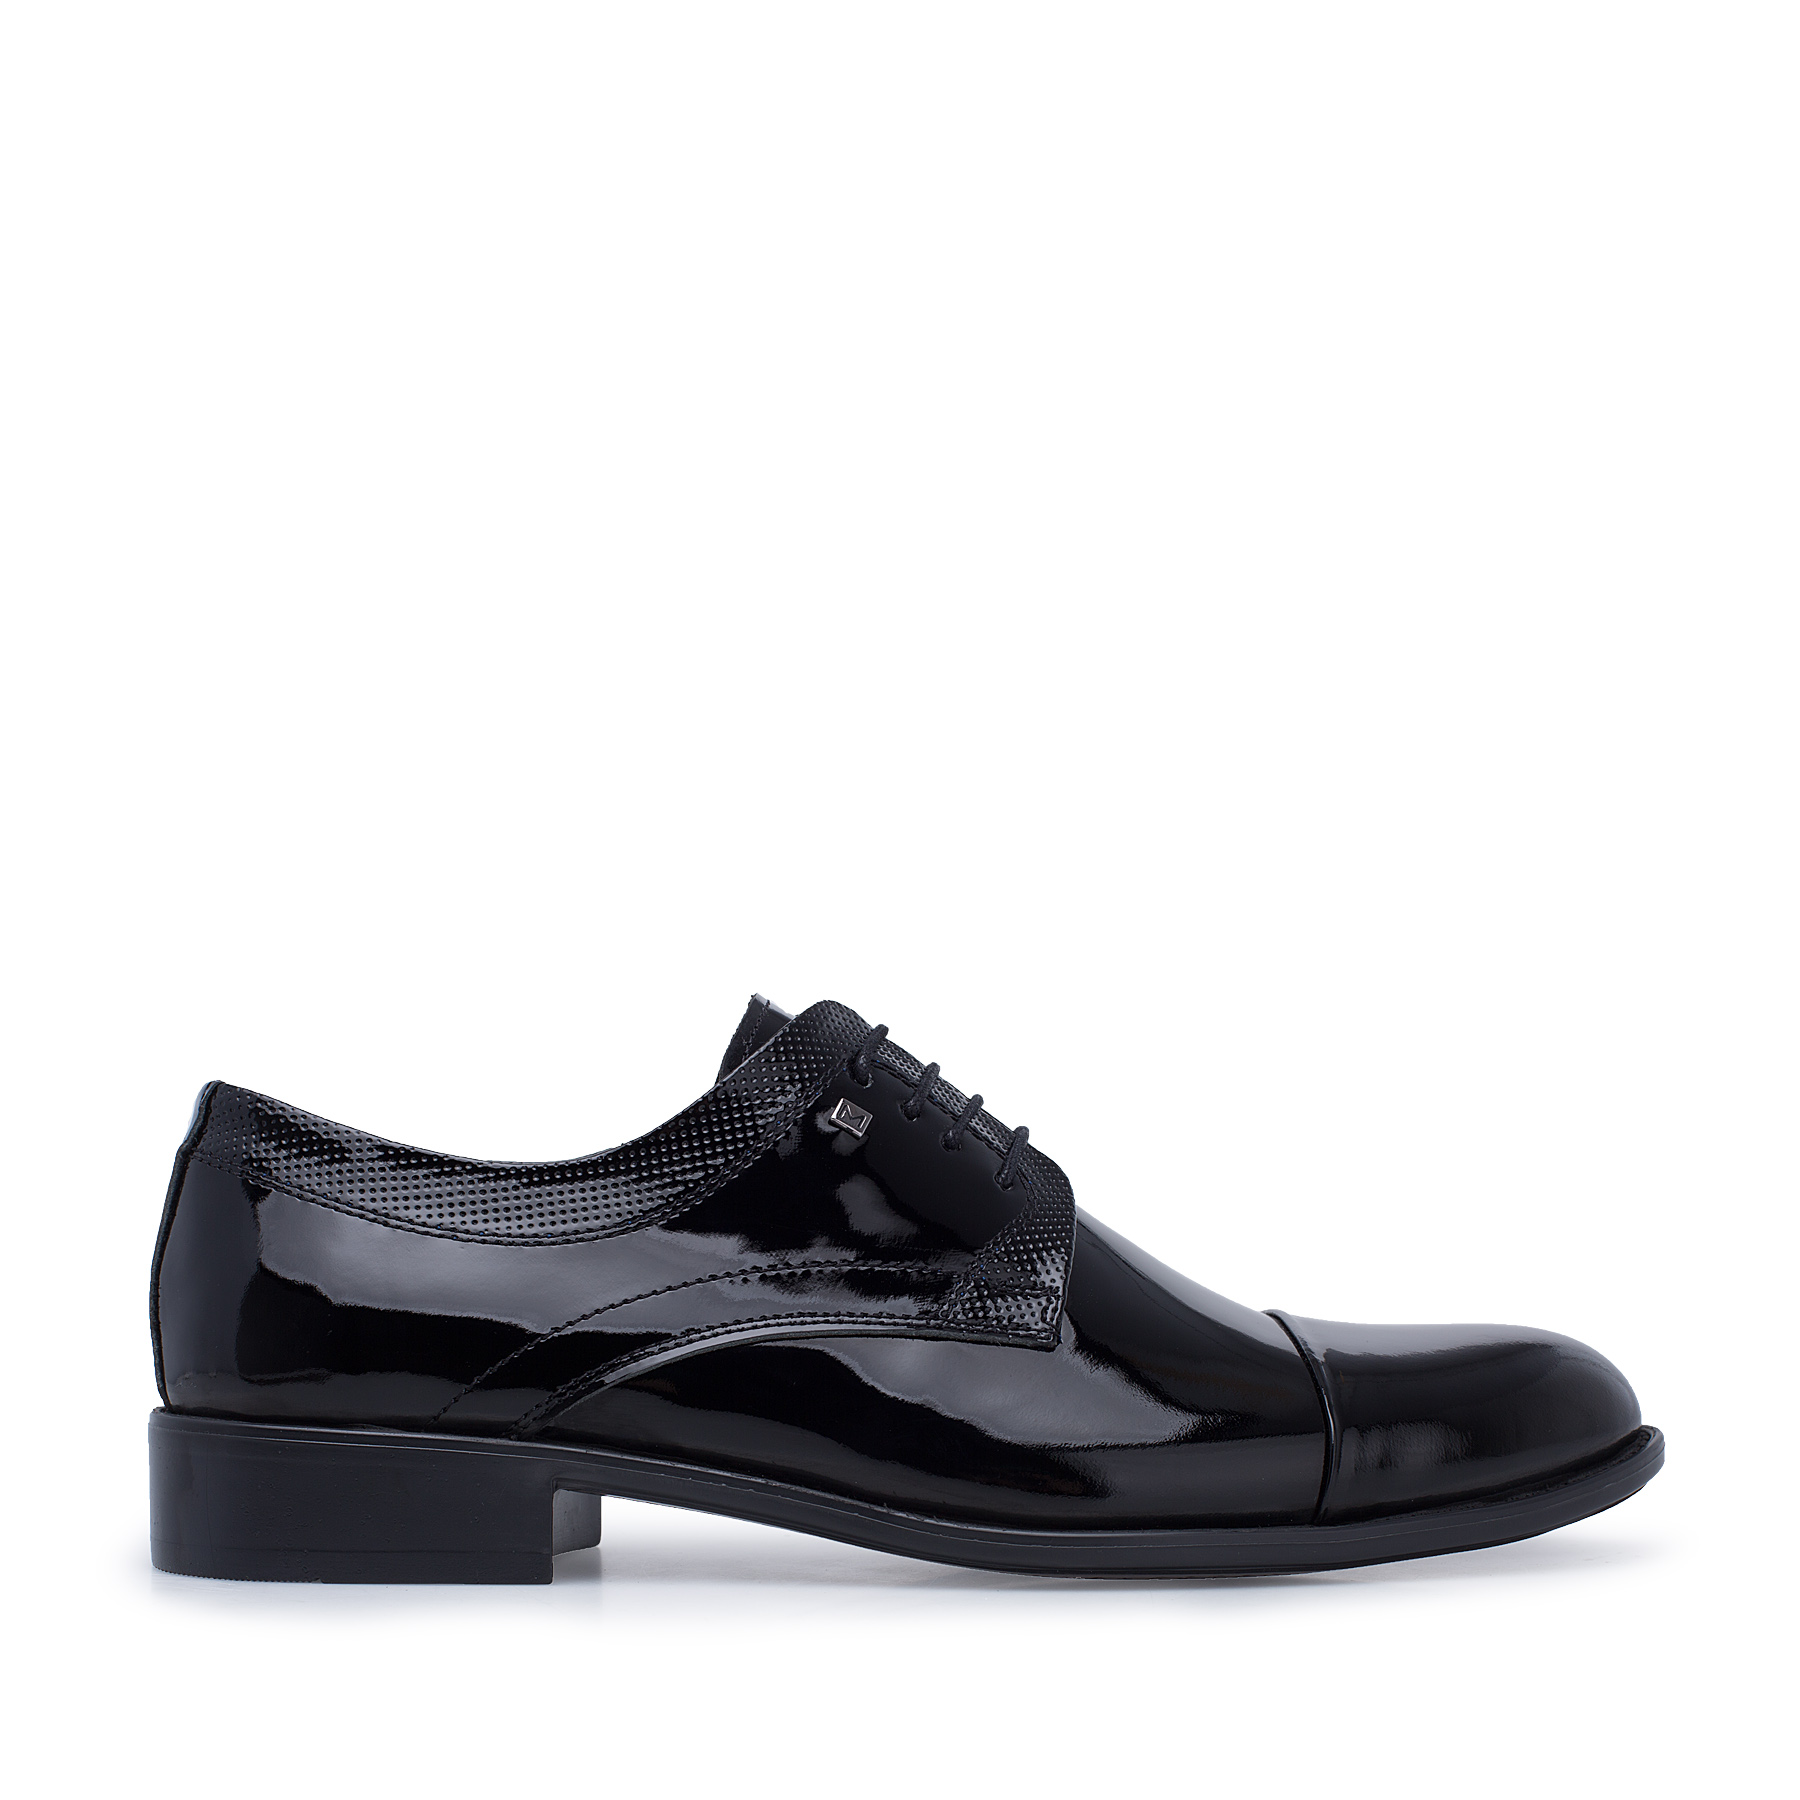 Marcomen Leather Shoes MALE SHOES 153400982